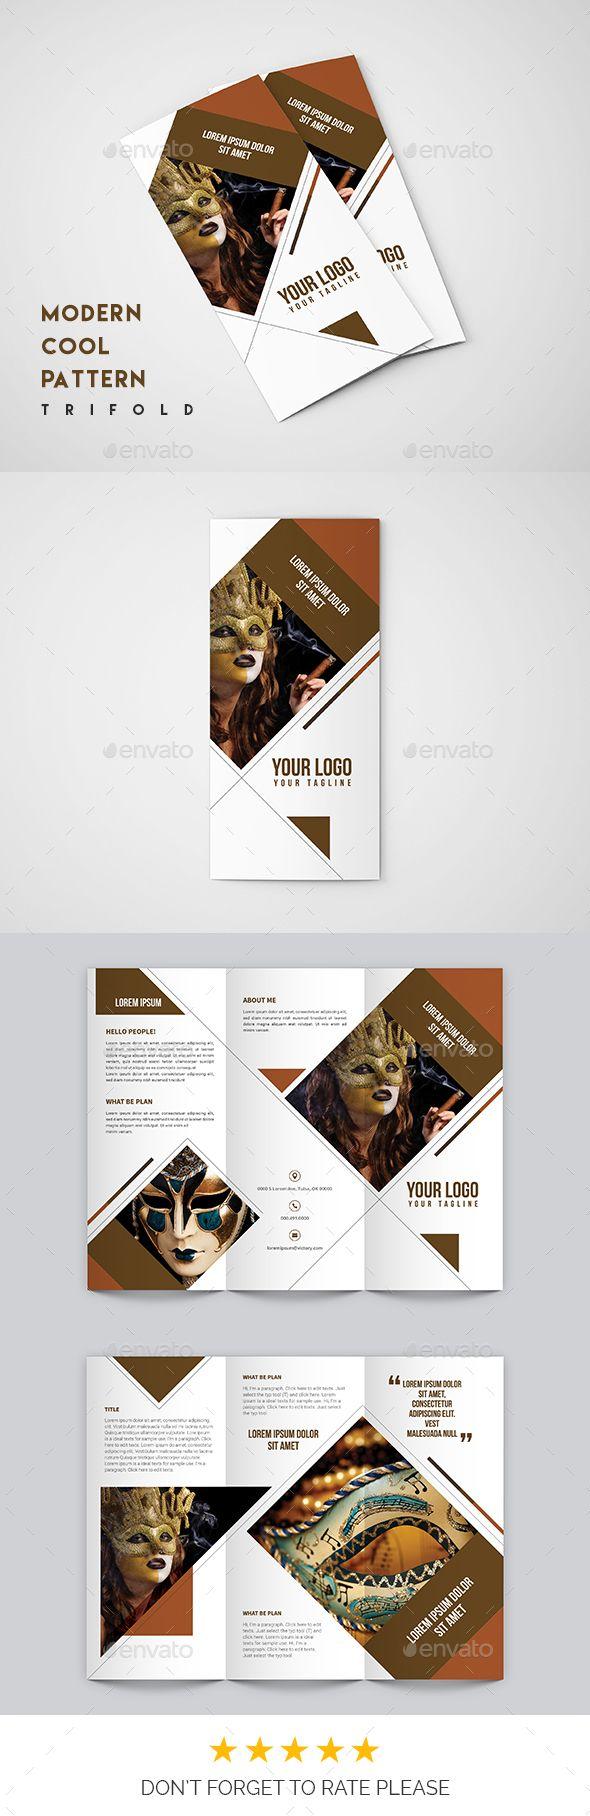 Morden Modern Cool Pattern Trifold Brochure Design Template- Catalogs Brochures Design Template PSD. Download here: https://graphicriver.net/item/morden-cool-pattern-trifold/19343345?ref=yinkira